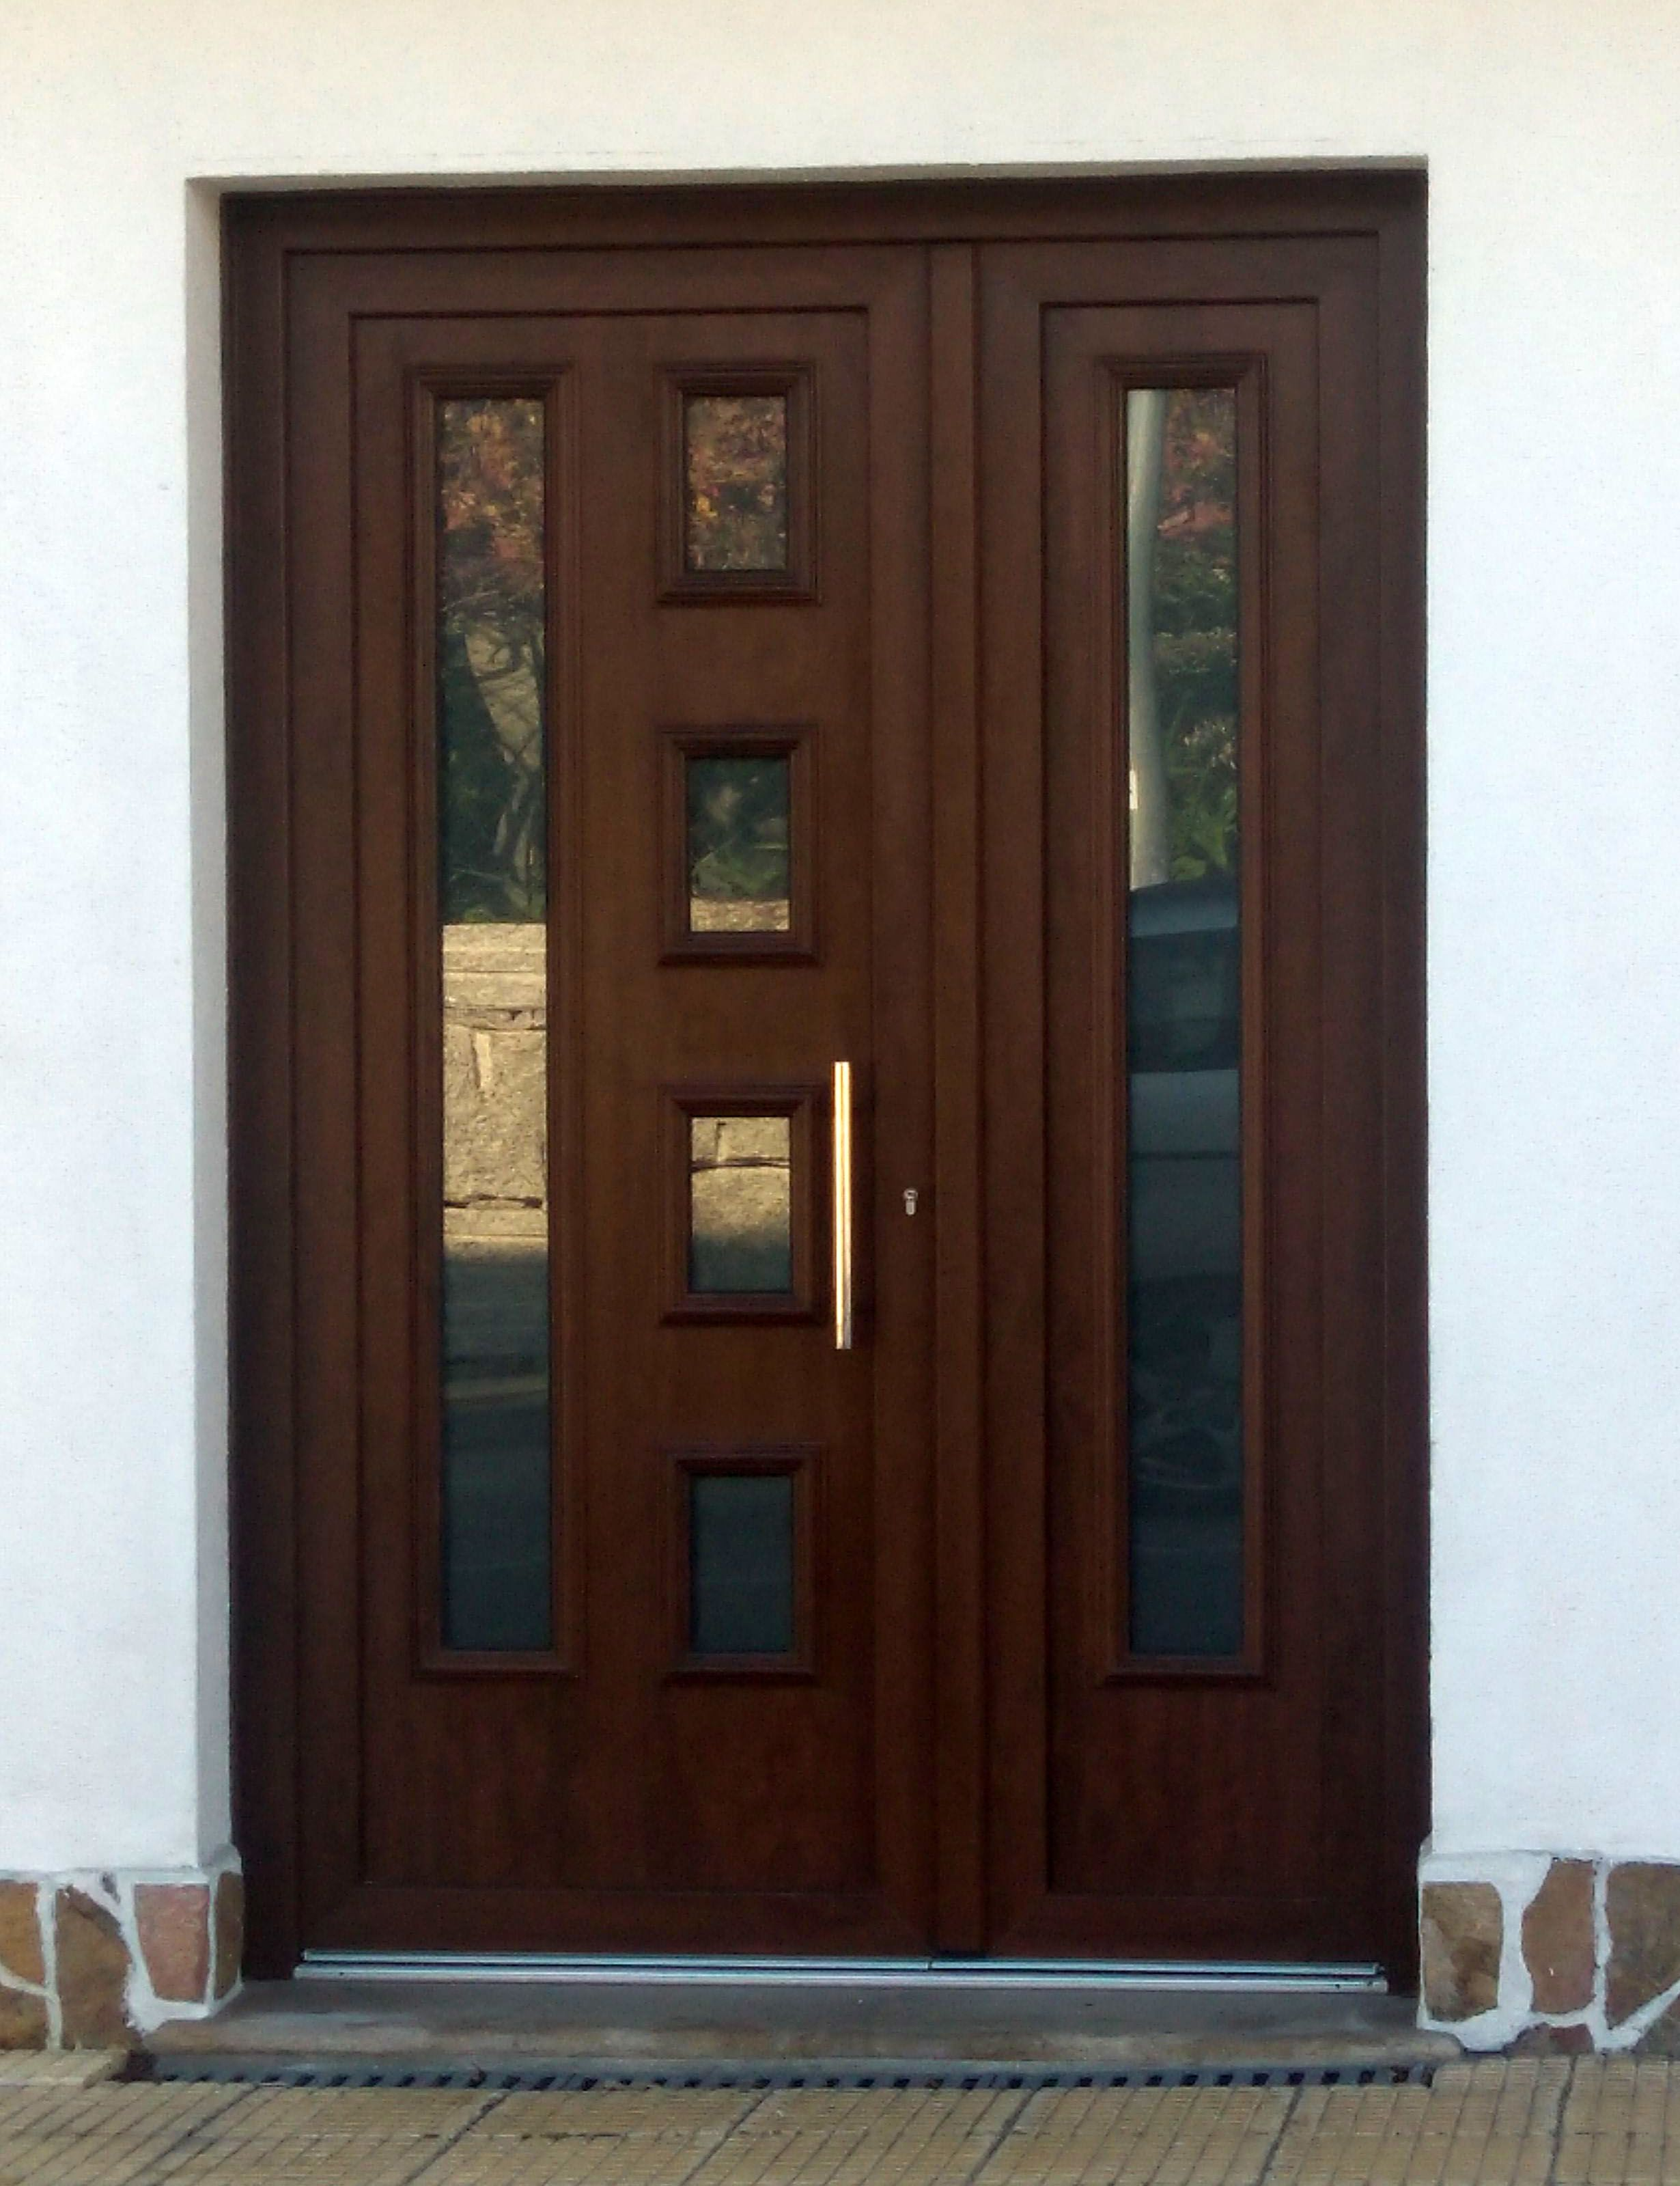 Tempo lira aluminio foliado indupanel paneles puertas for Puertas de pvc para exterior precios